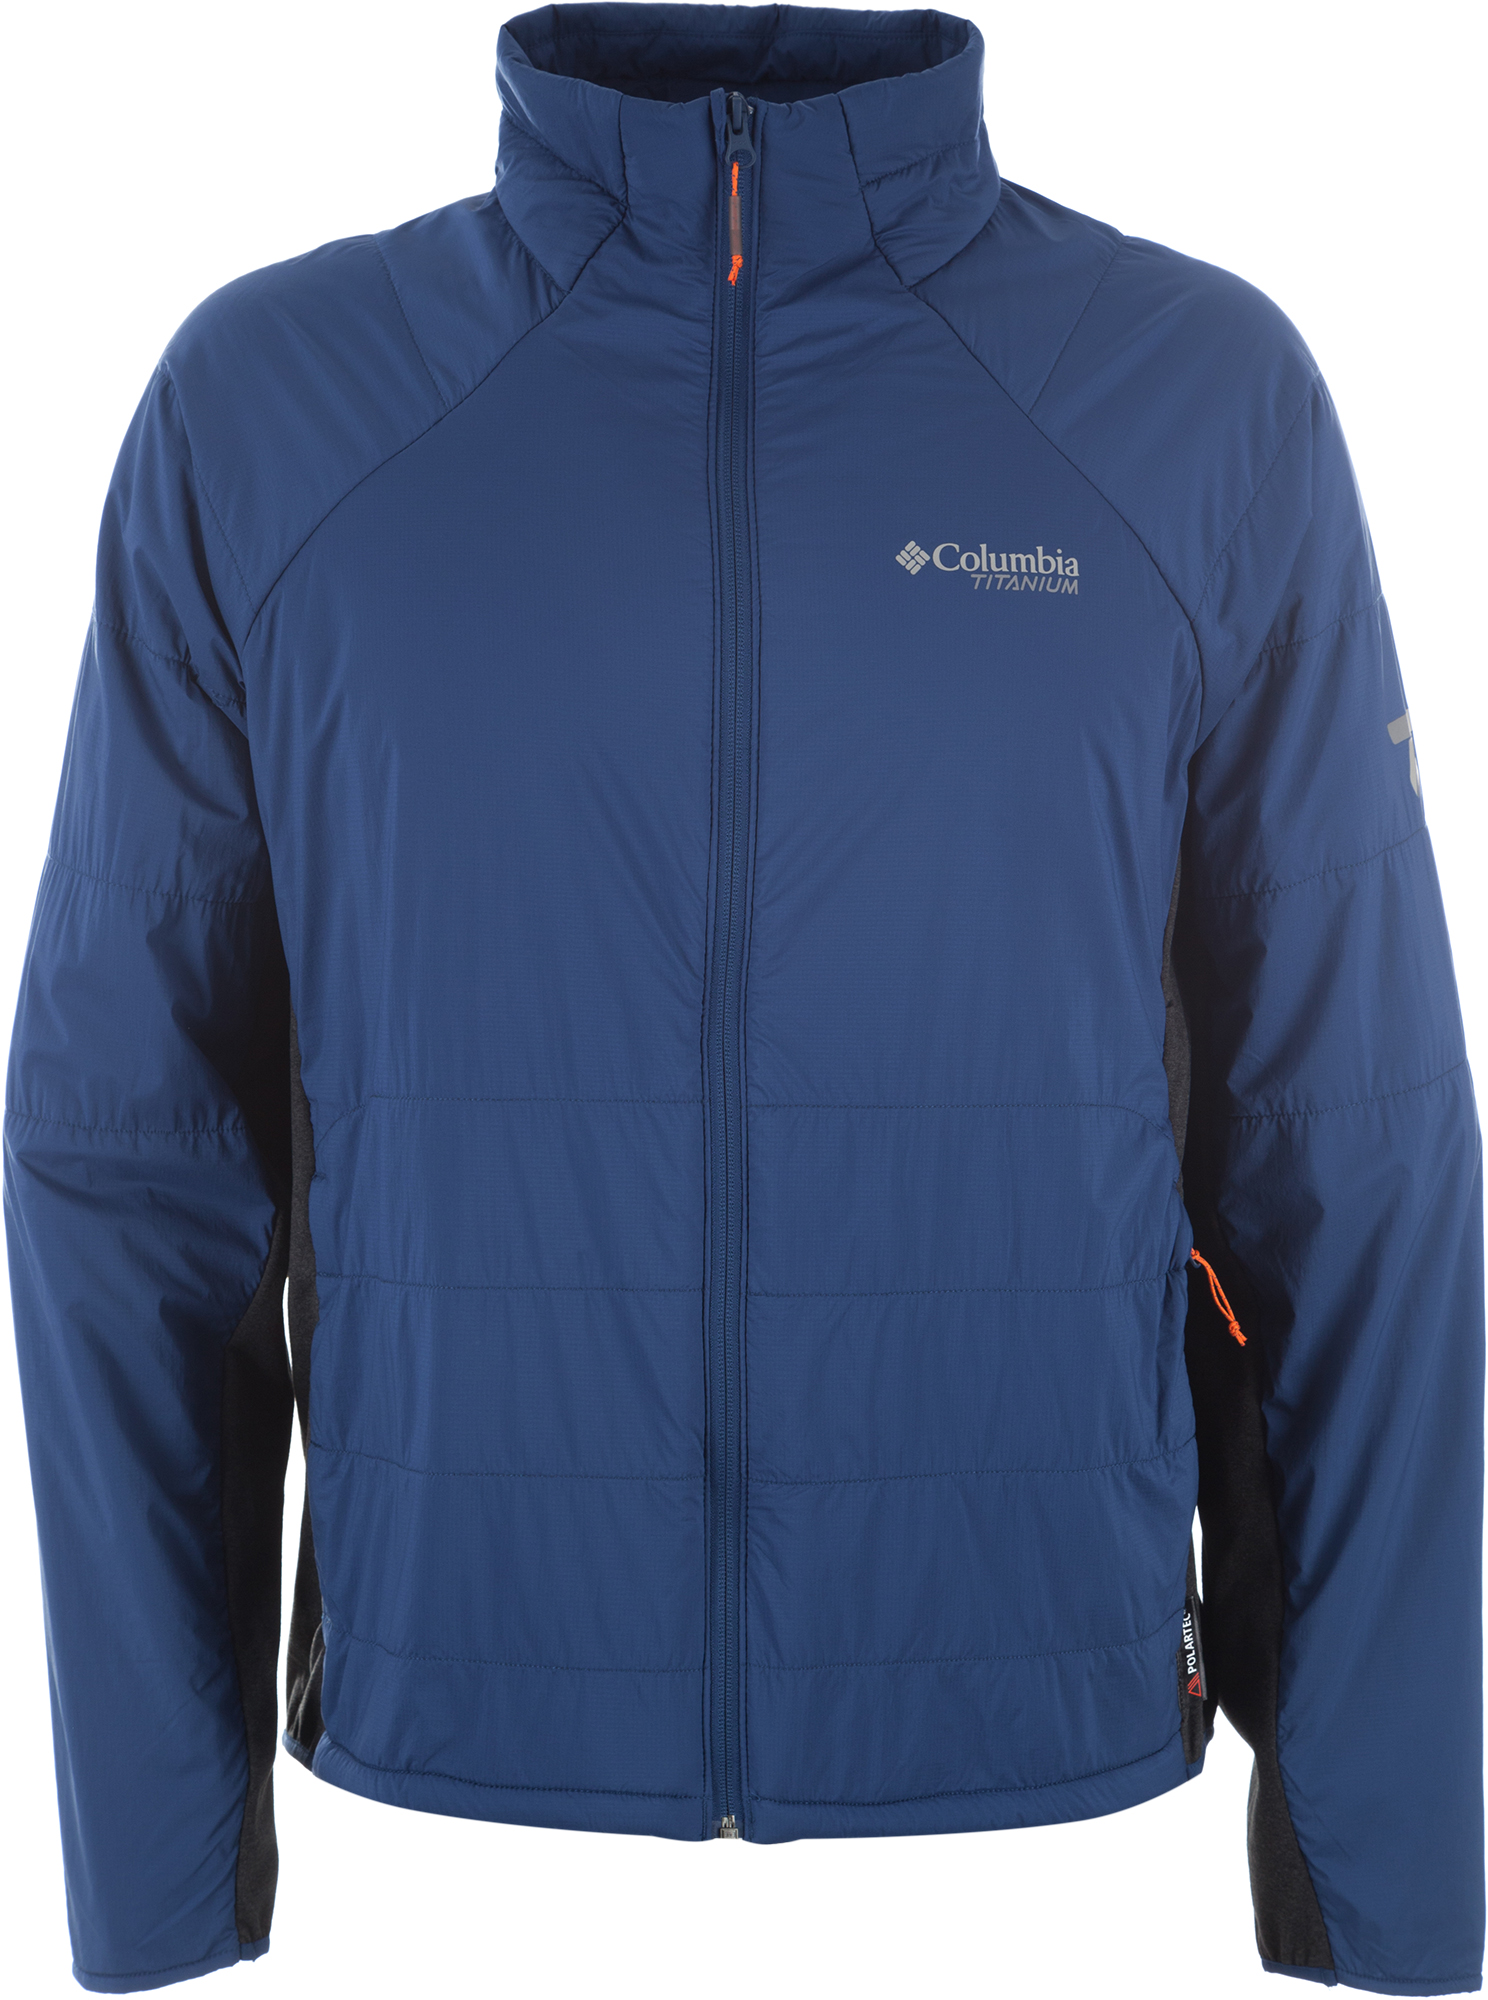 Columbia Куртка утепленная мужская Columbia Alpine Traverse, размер 46-48 columbia куртка 3 в 1 мужская columbia whirlibird размер 48 50